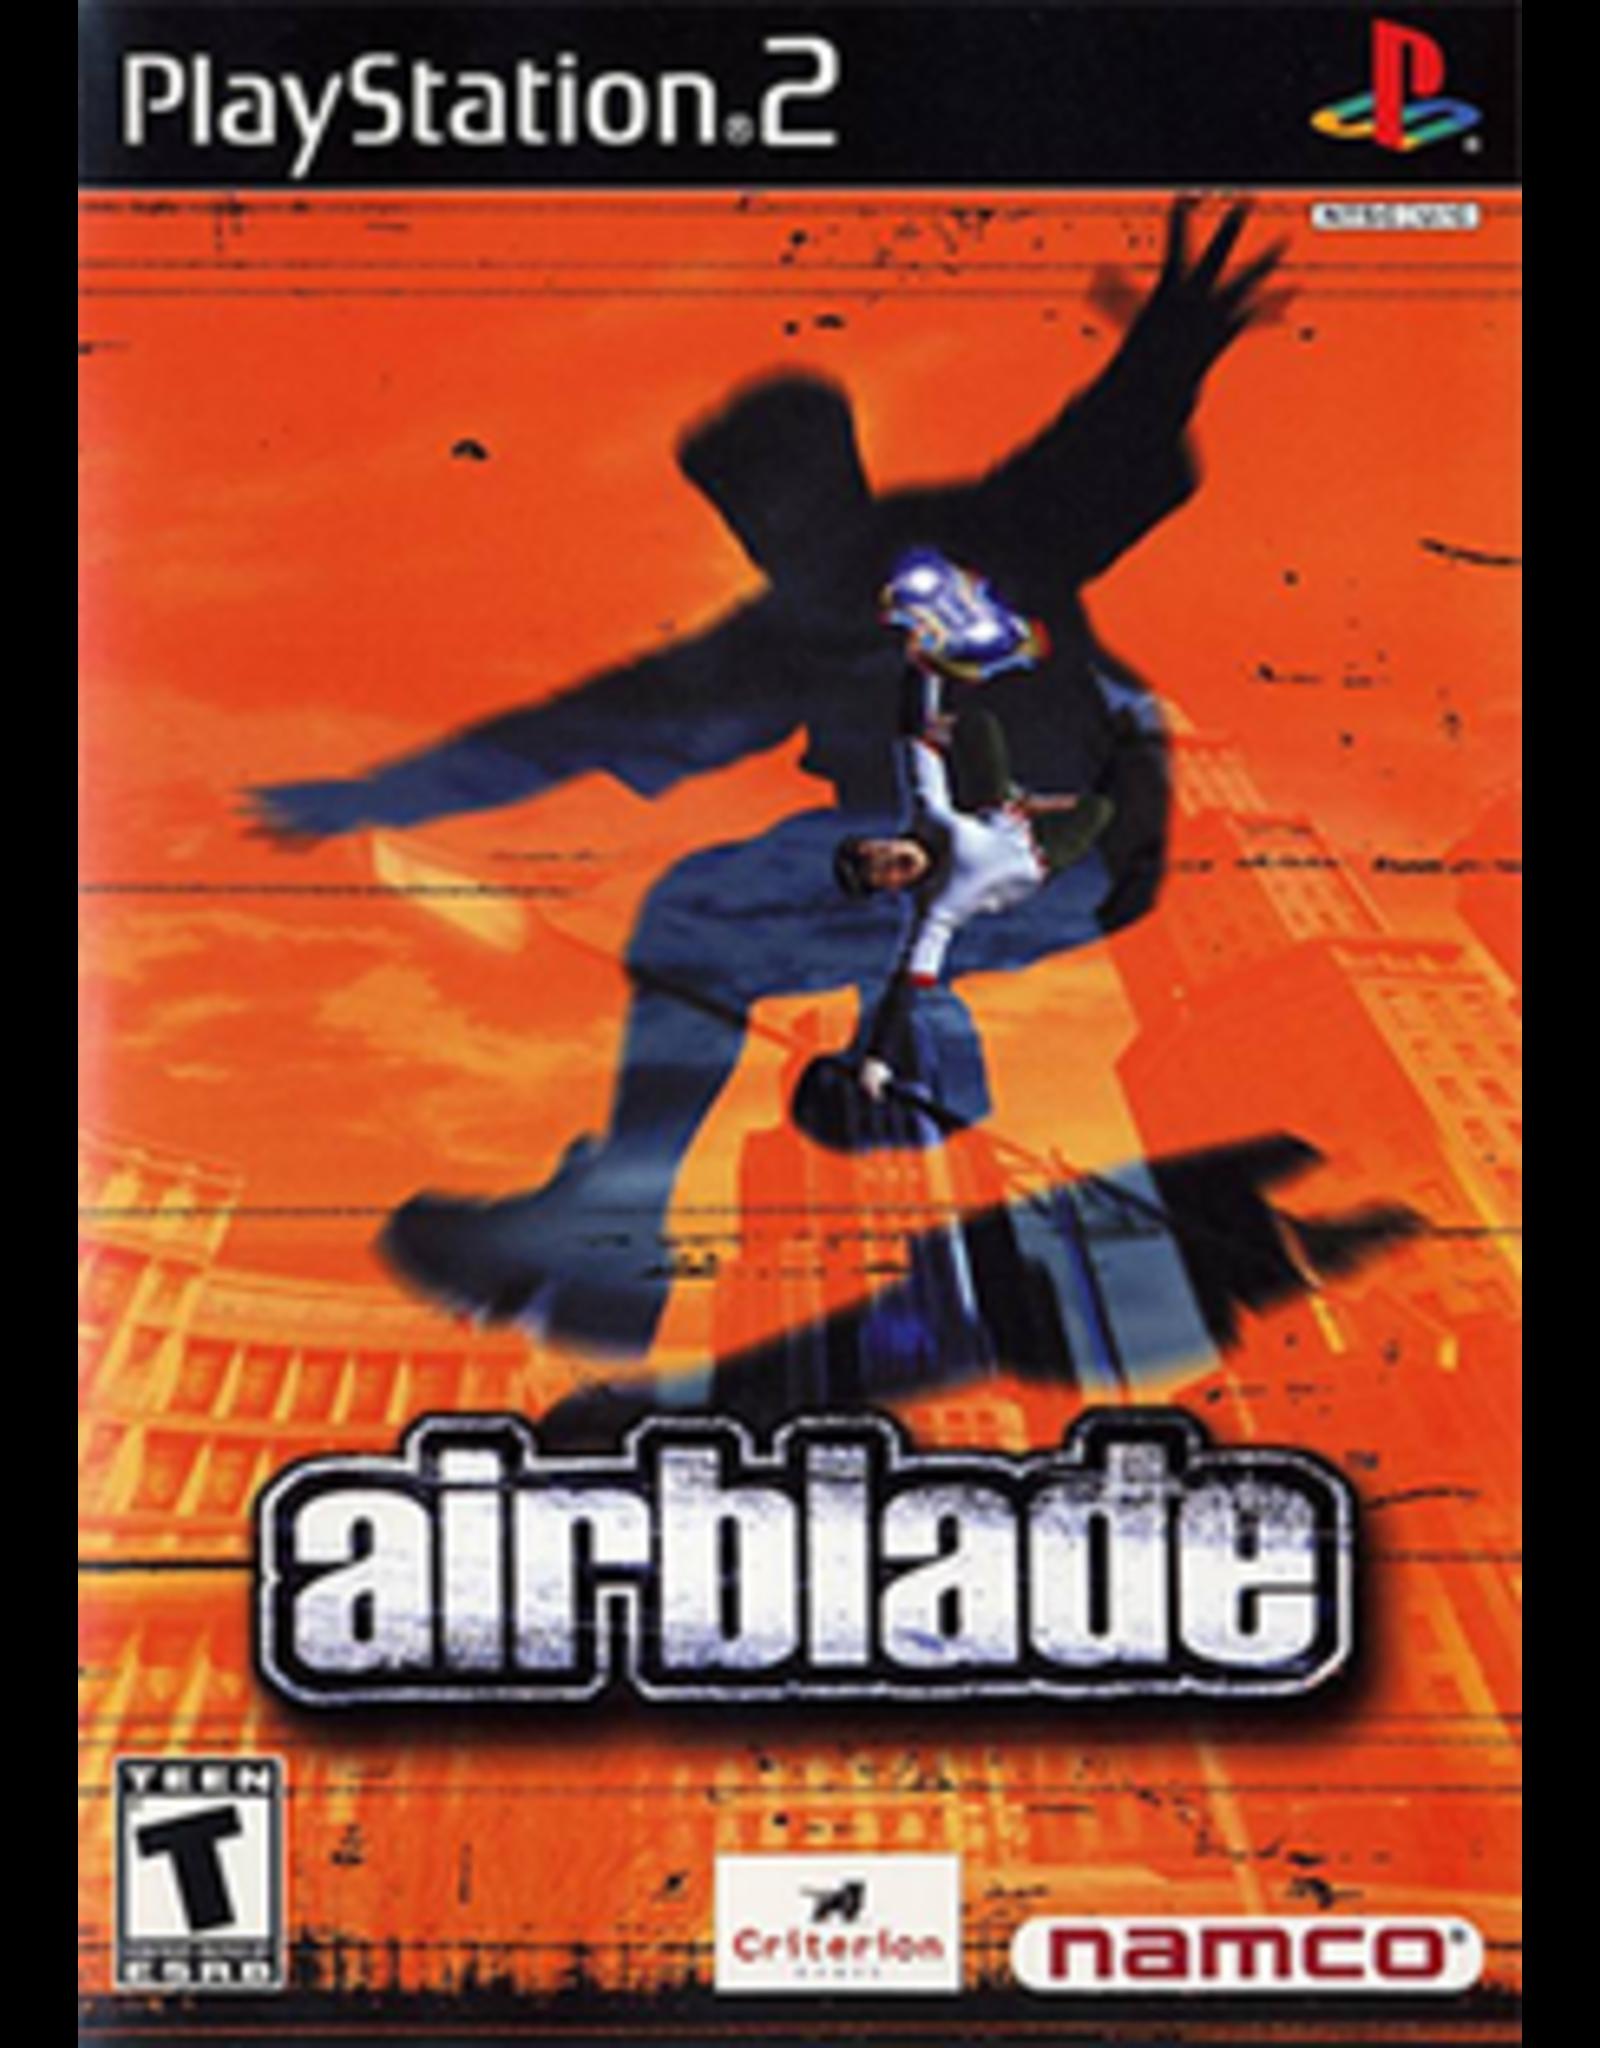 Playstation 2 Airblade (CiB)